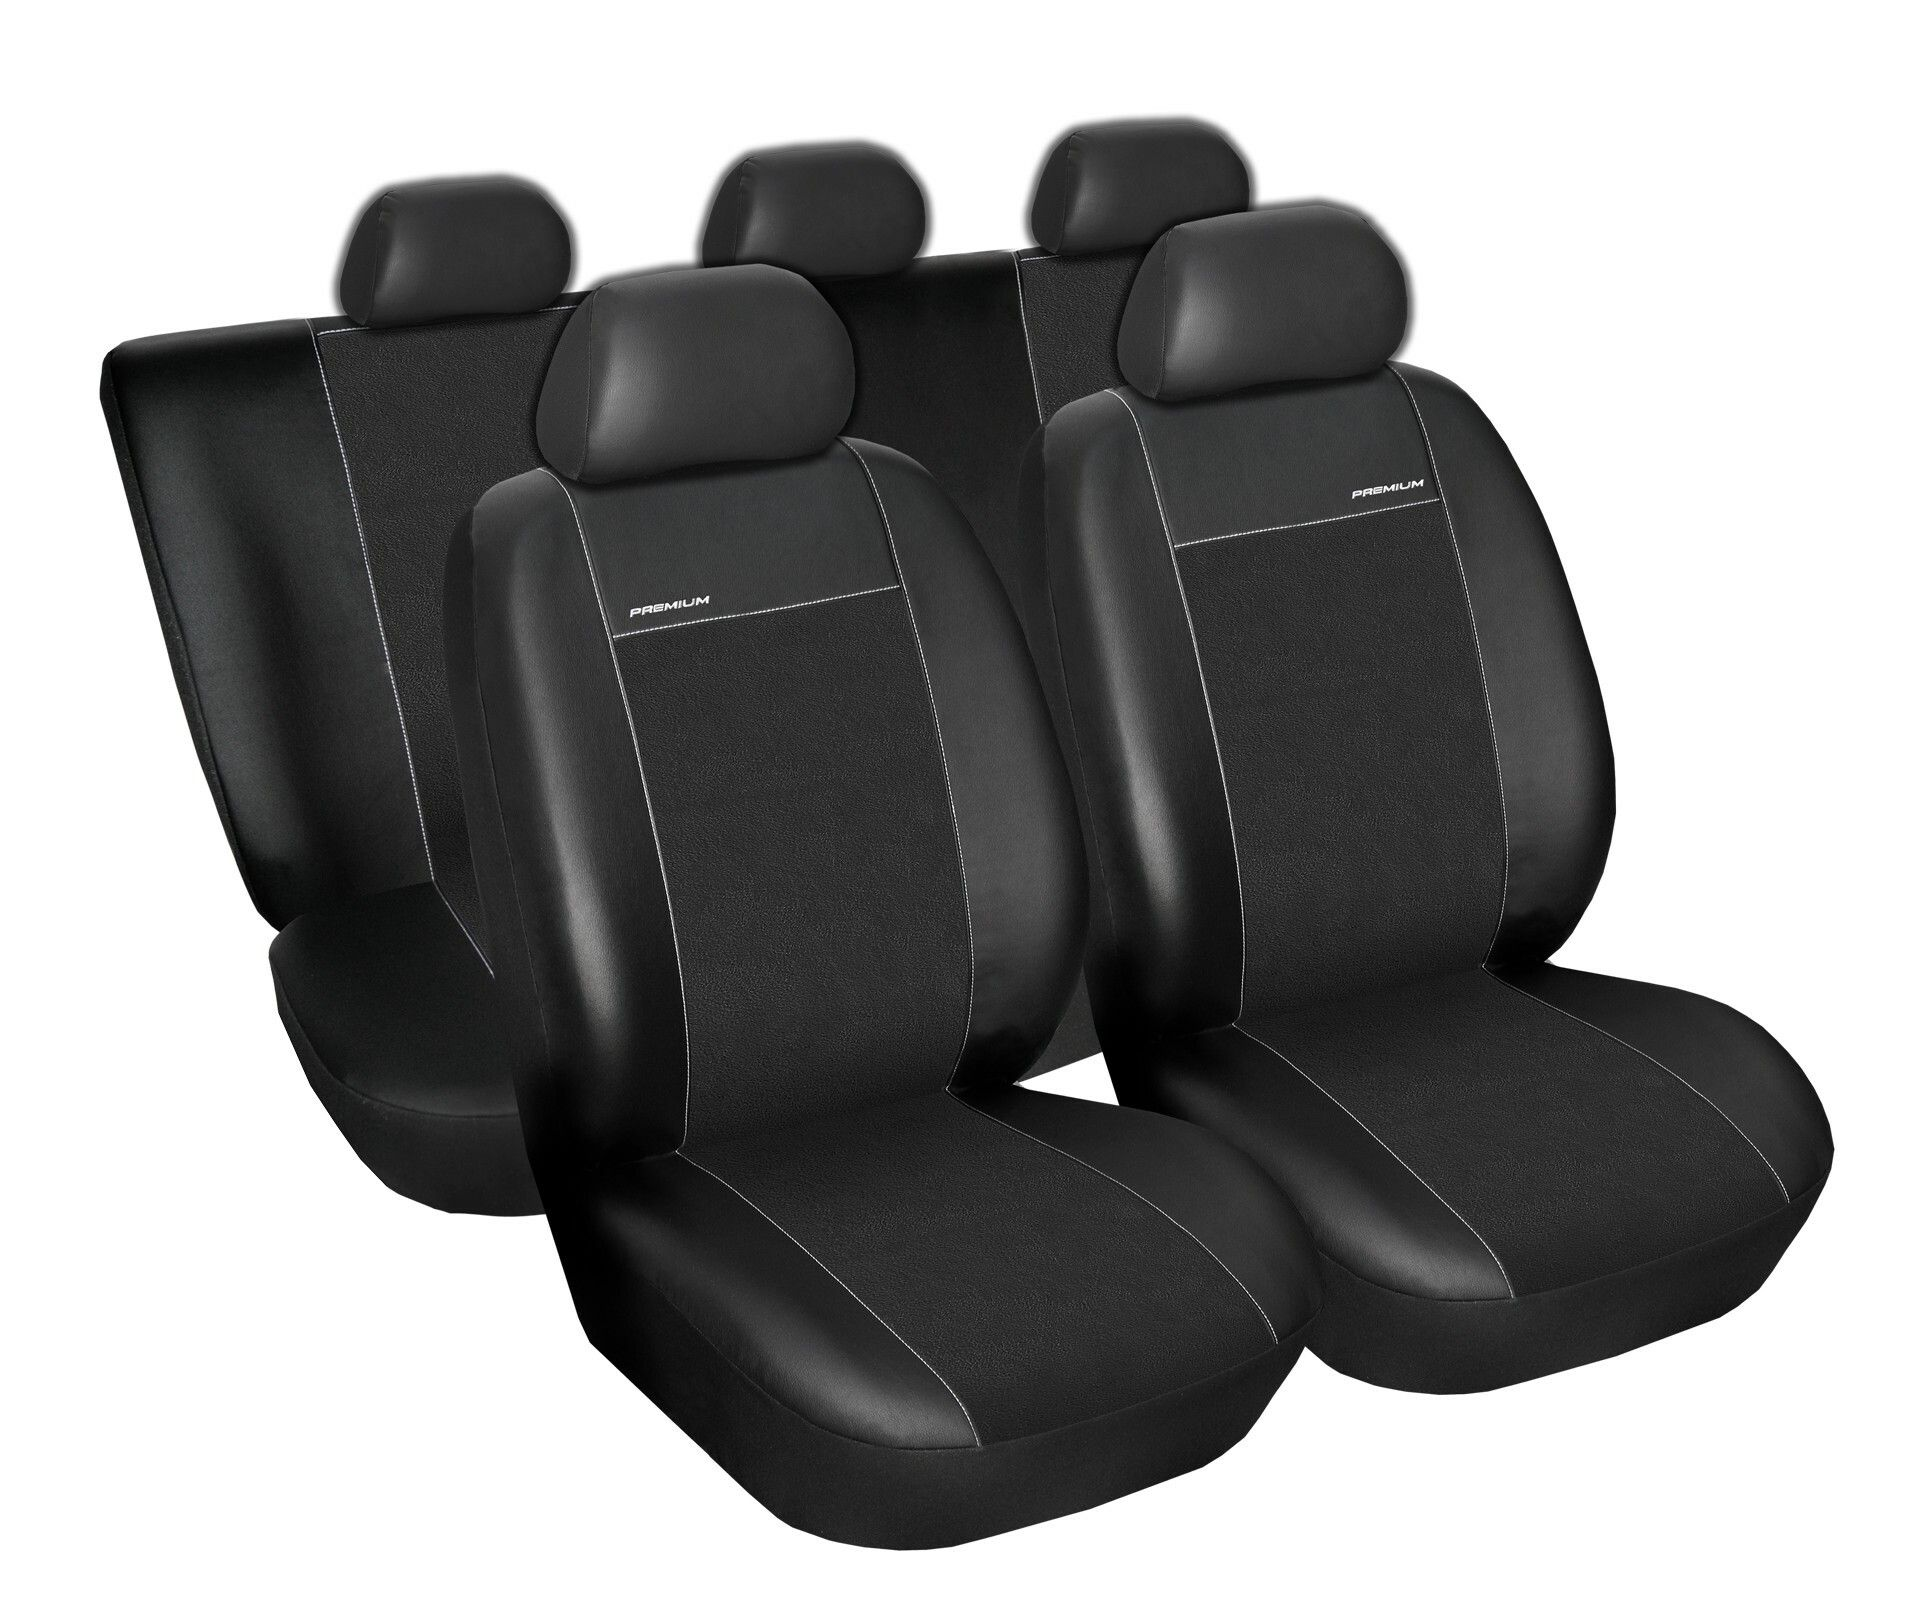 Autopotahy Volkswagen Passat B6 , sedan, od r 2005, Eco kůže + alcantara černé